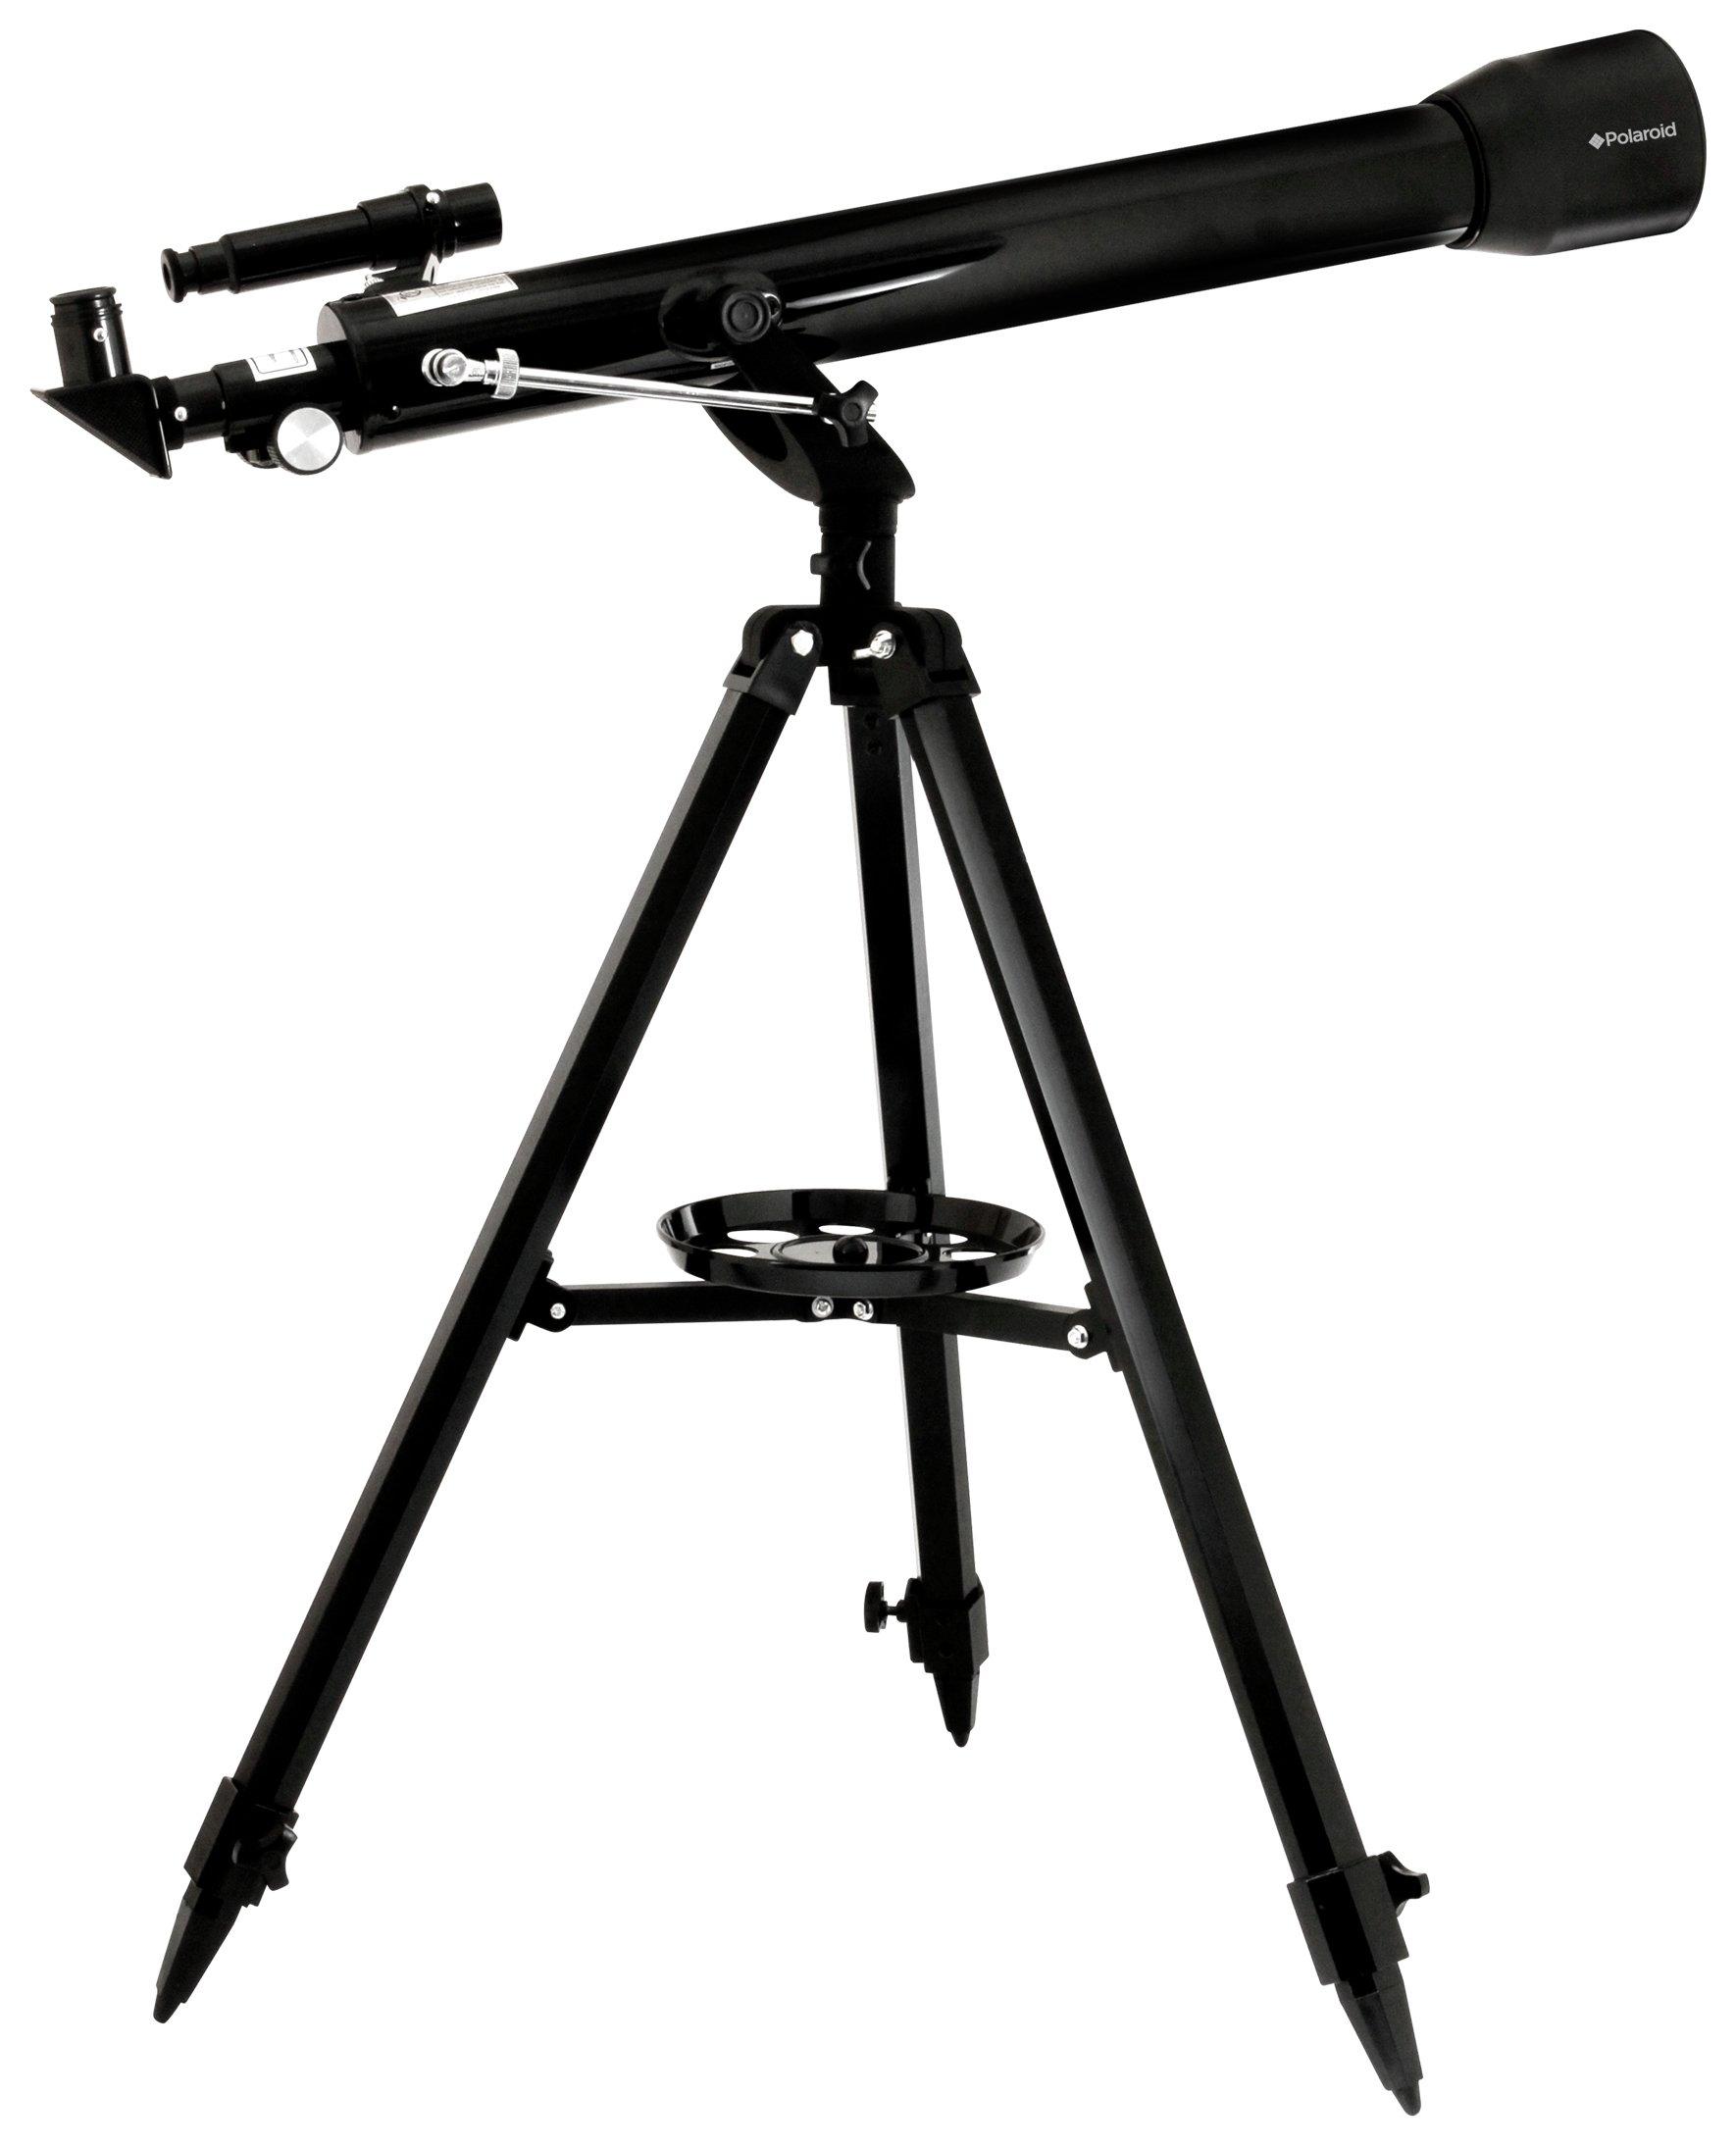 Polaroid IB52RFR Refractor Telescope - Black